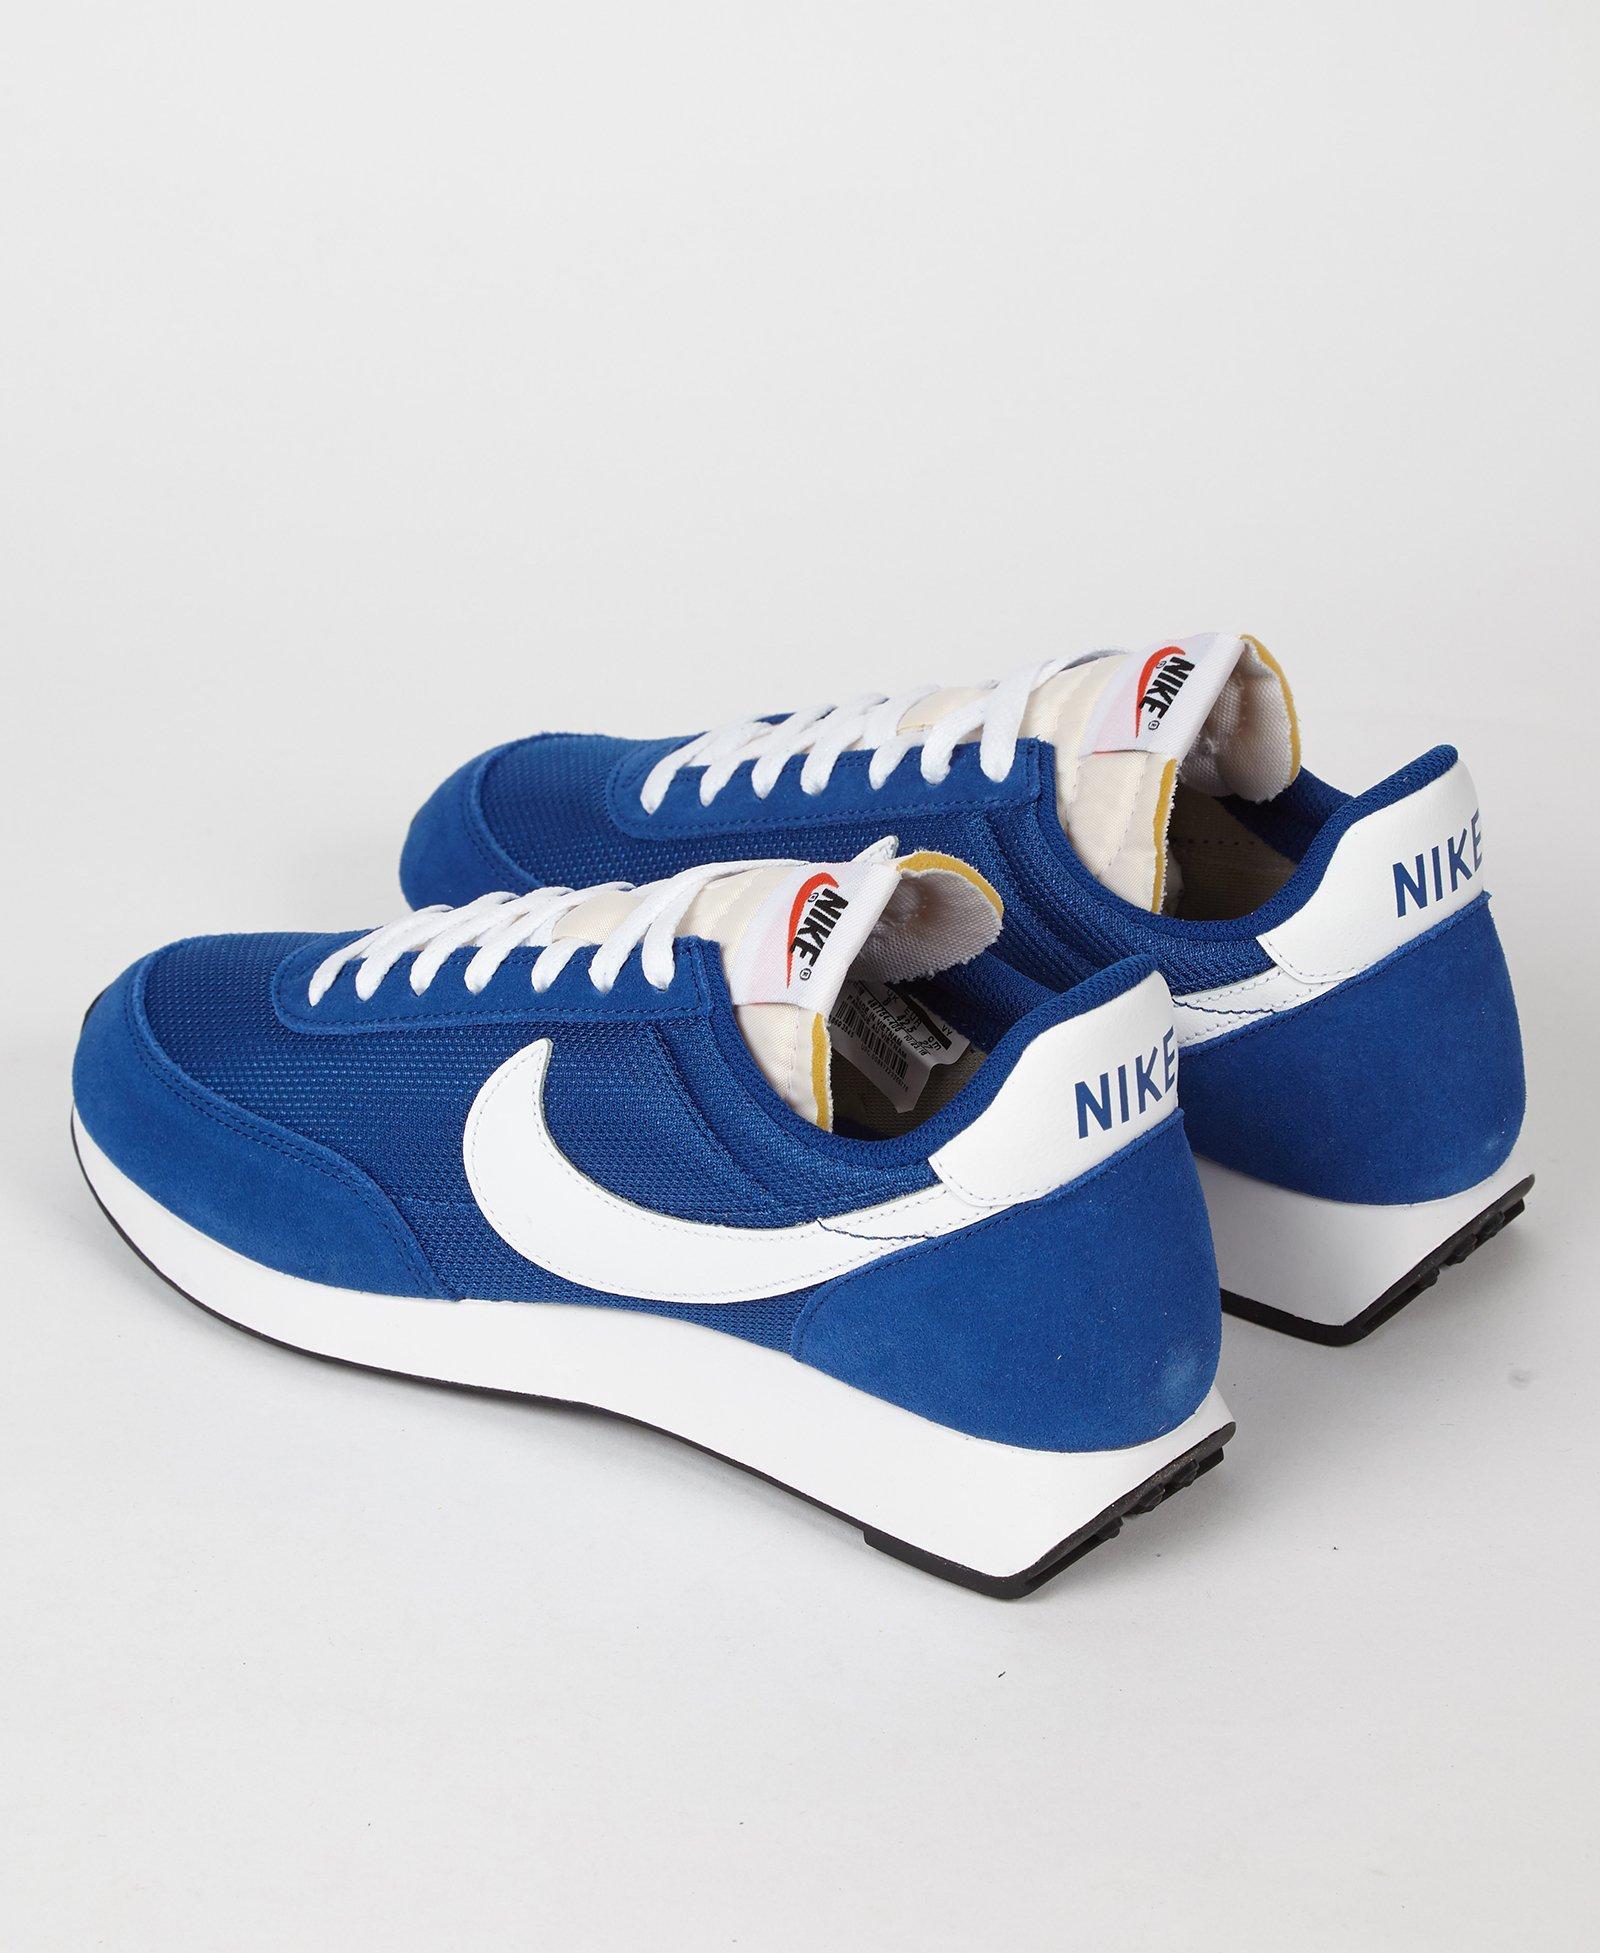 9b5c1235d54 Lyst - Nike Indigo Force Tailwind 79 in Blue for Men